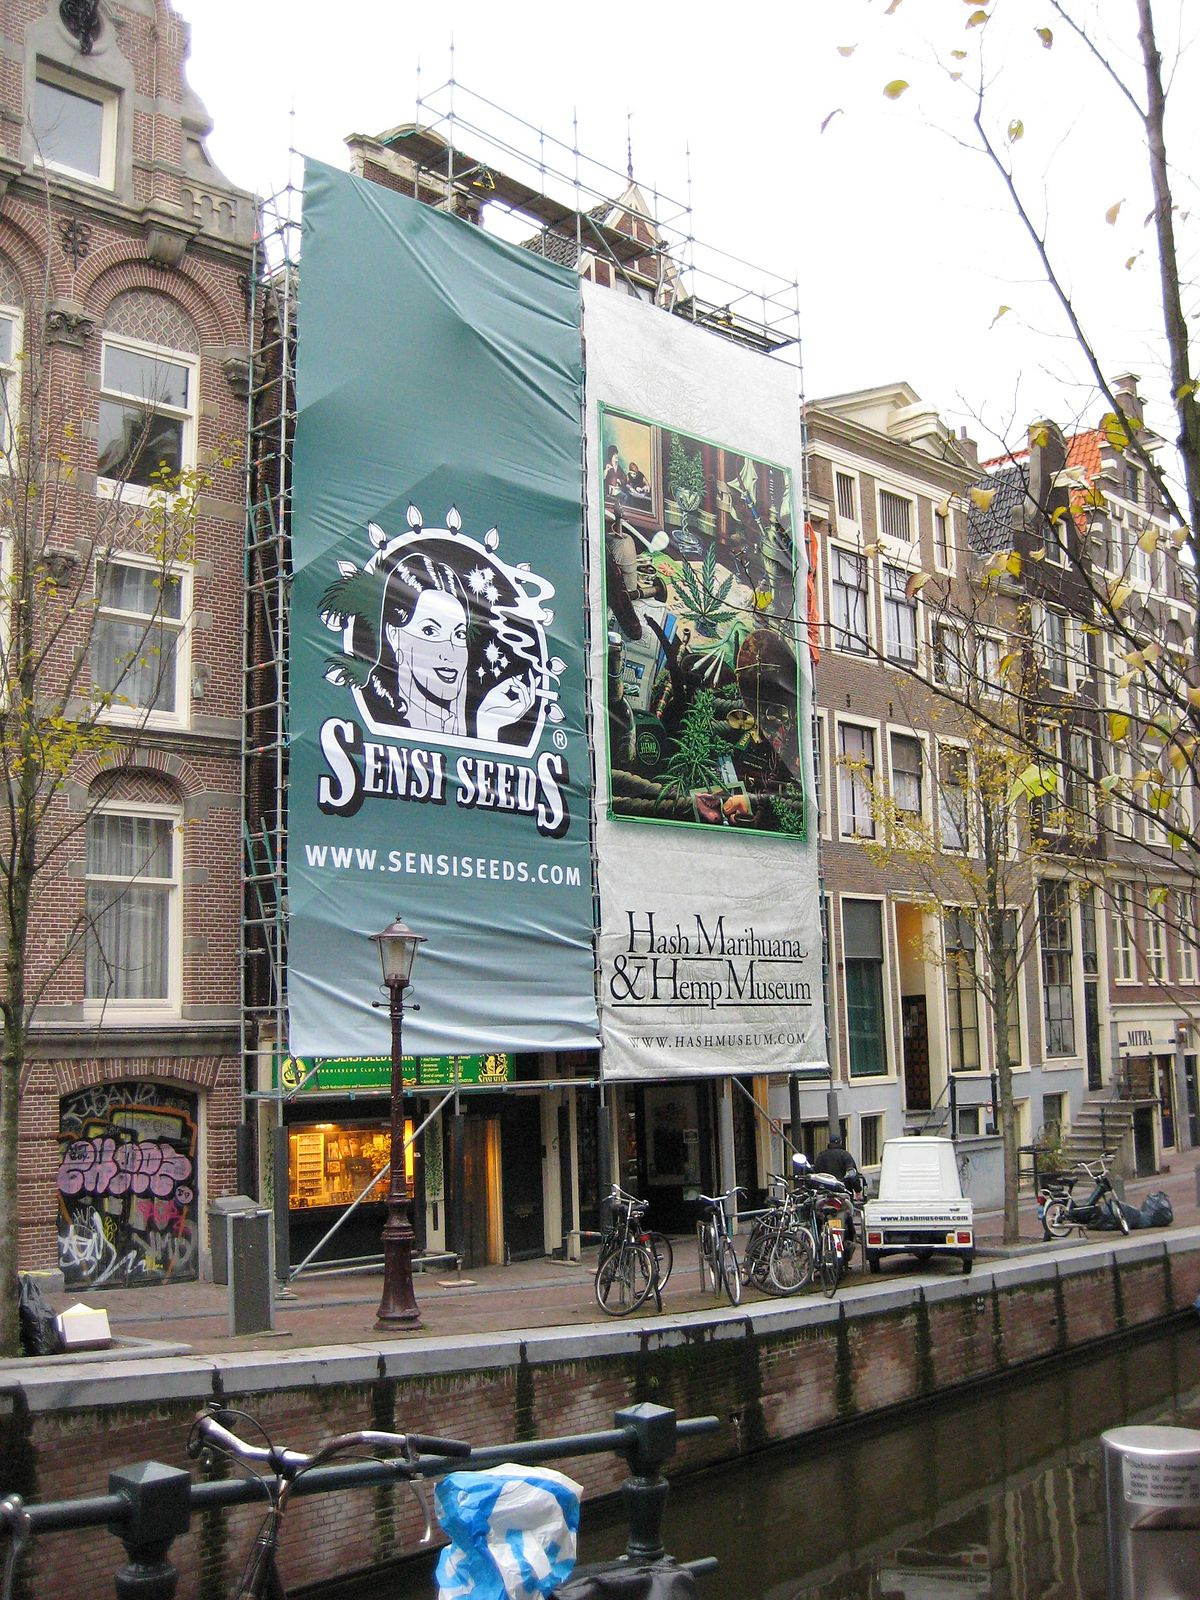 Hash museum amsterdam.JPG